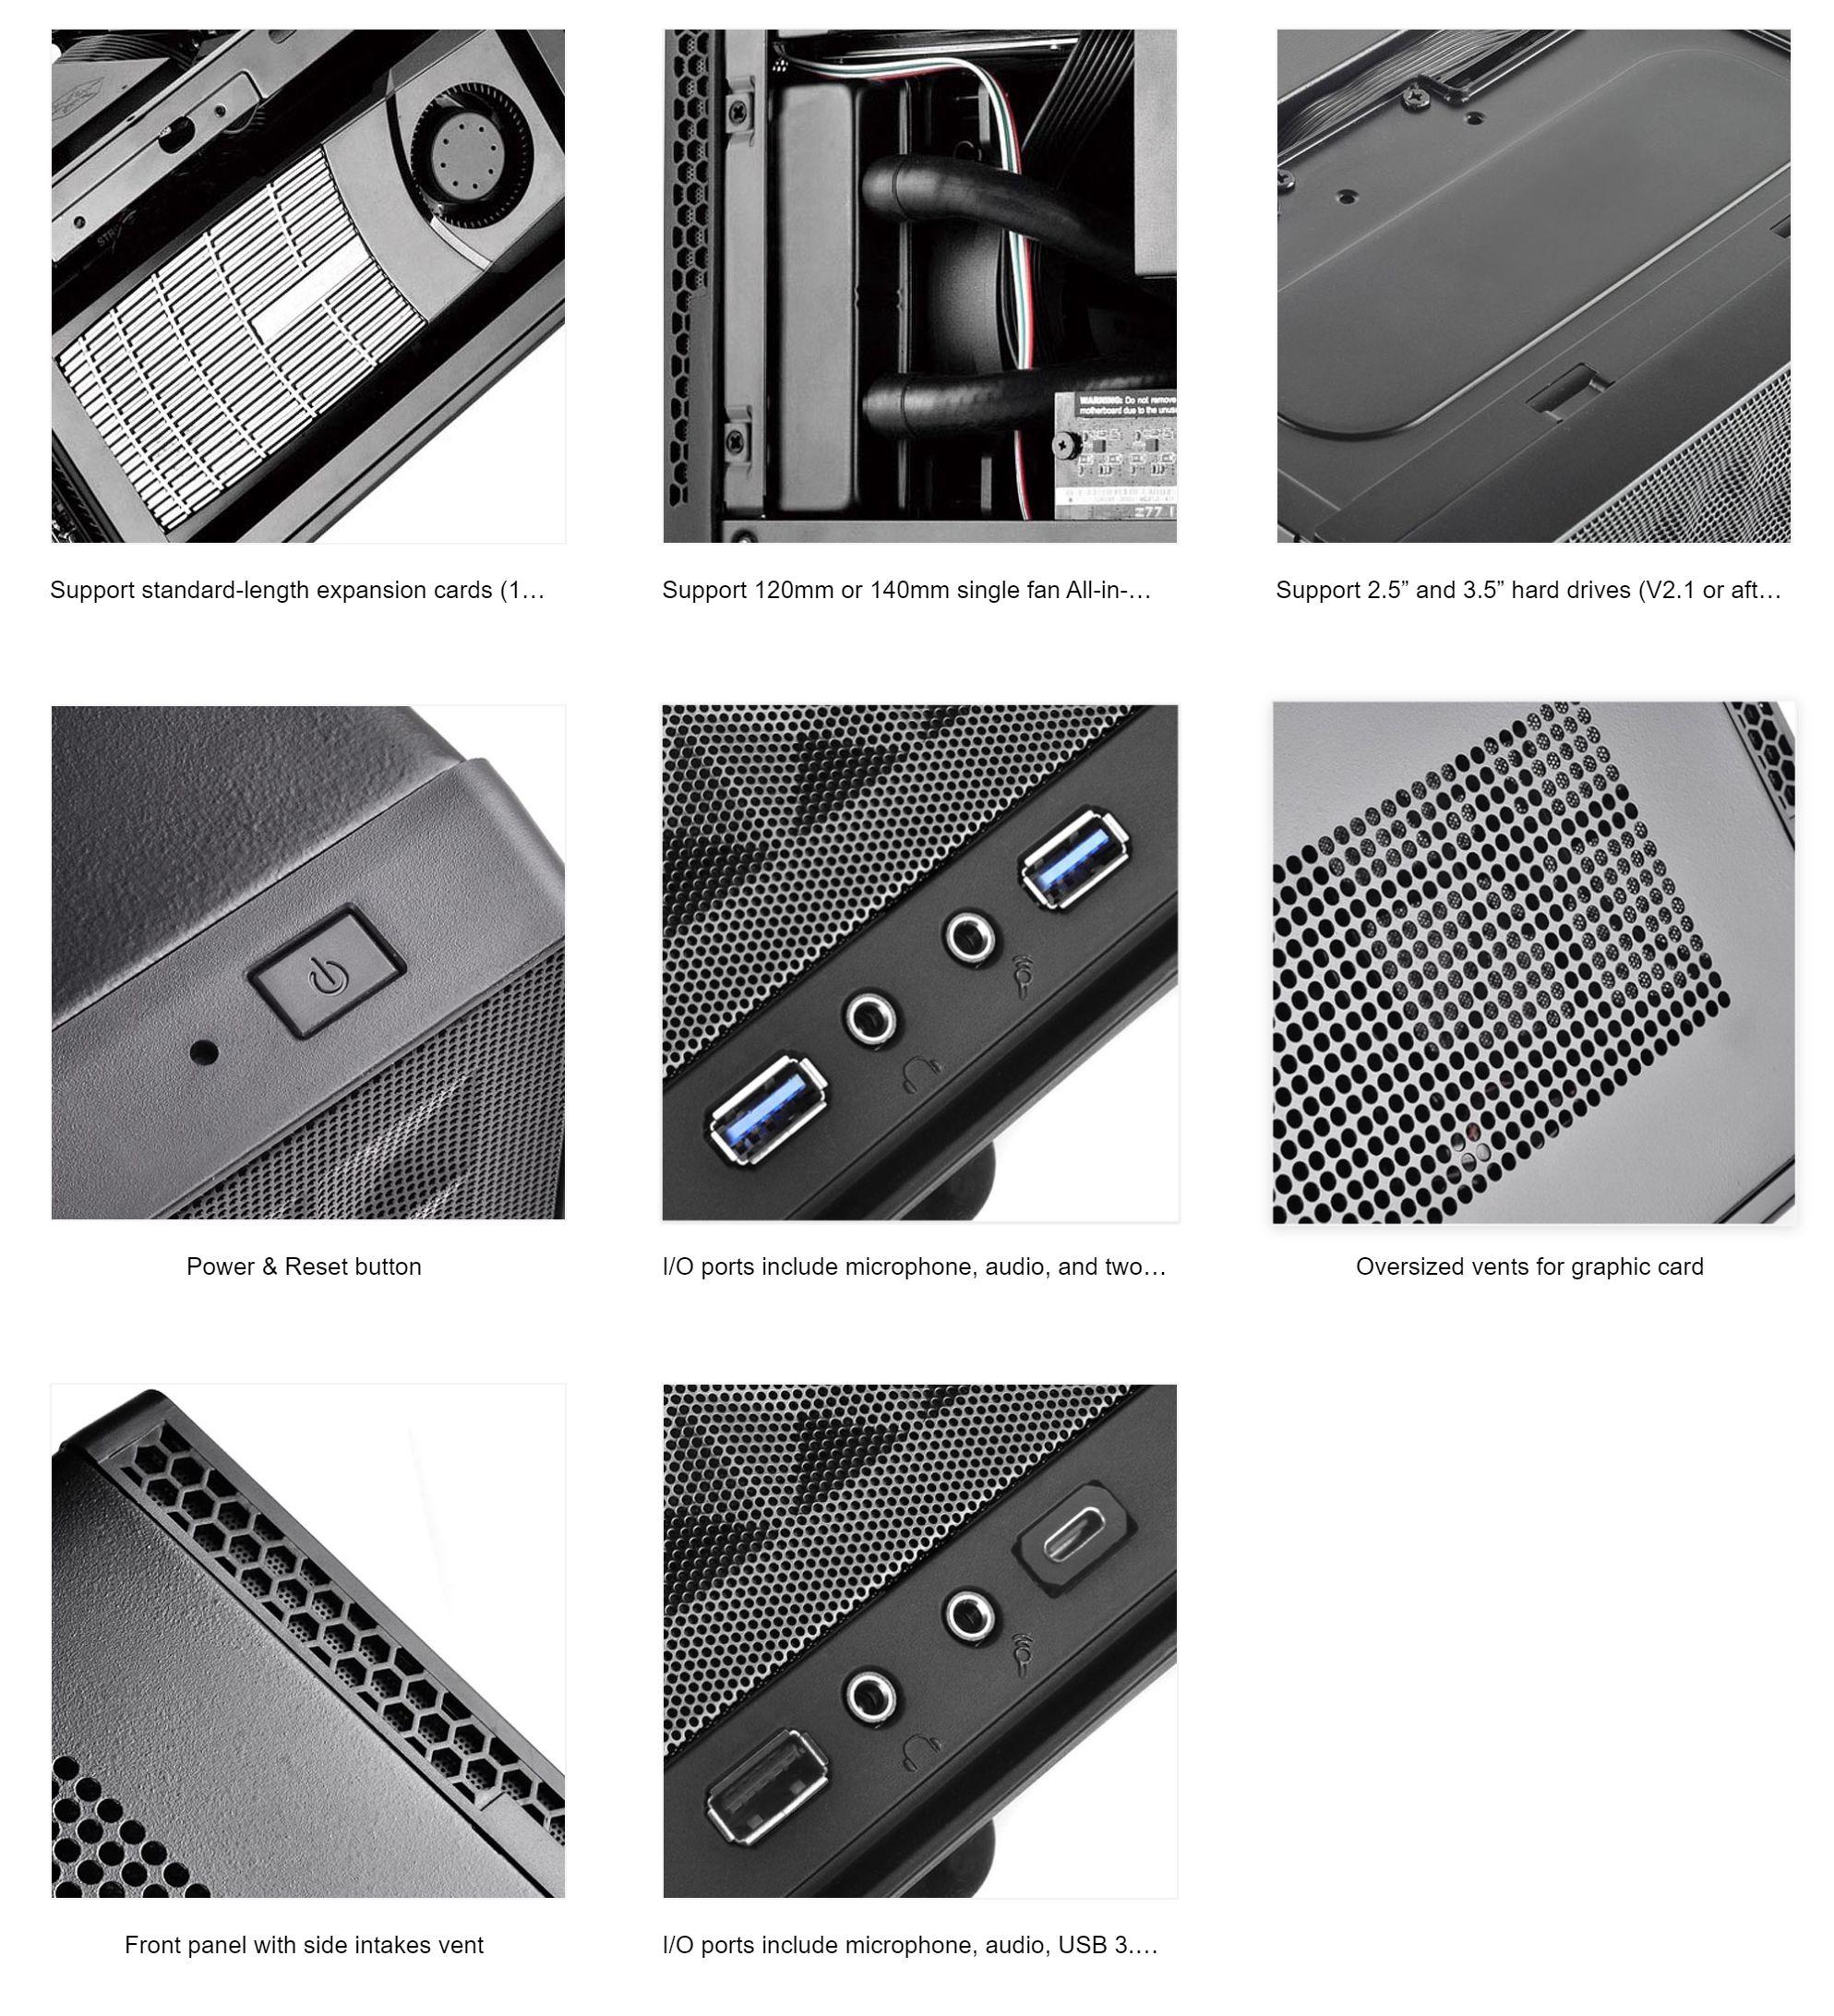 #1759 - 'SilverStone SG13 INTRODUCTION' - silverstonetek_com.jpg